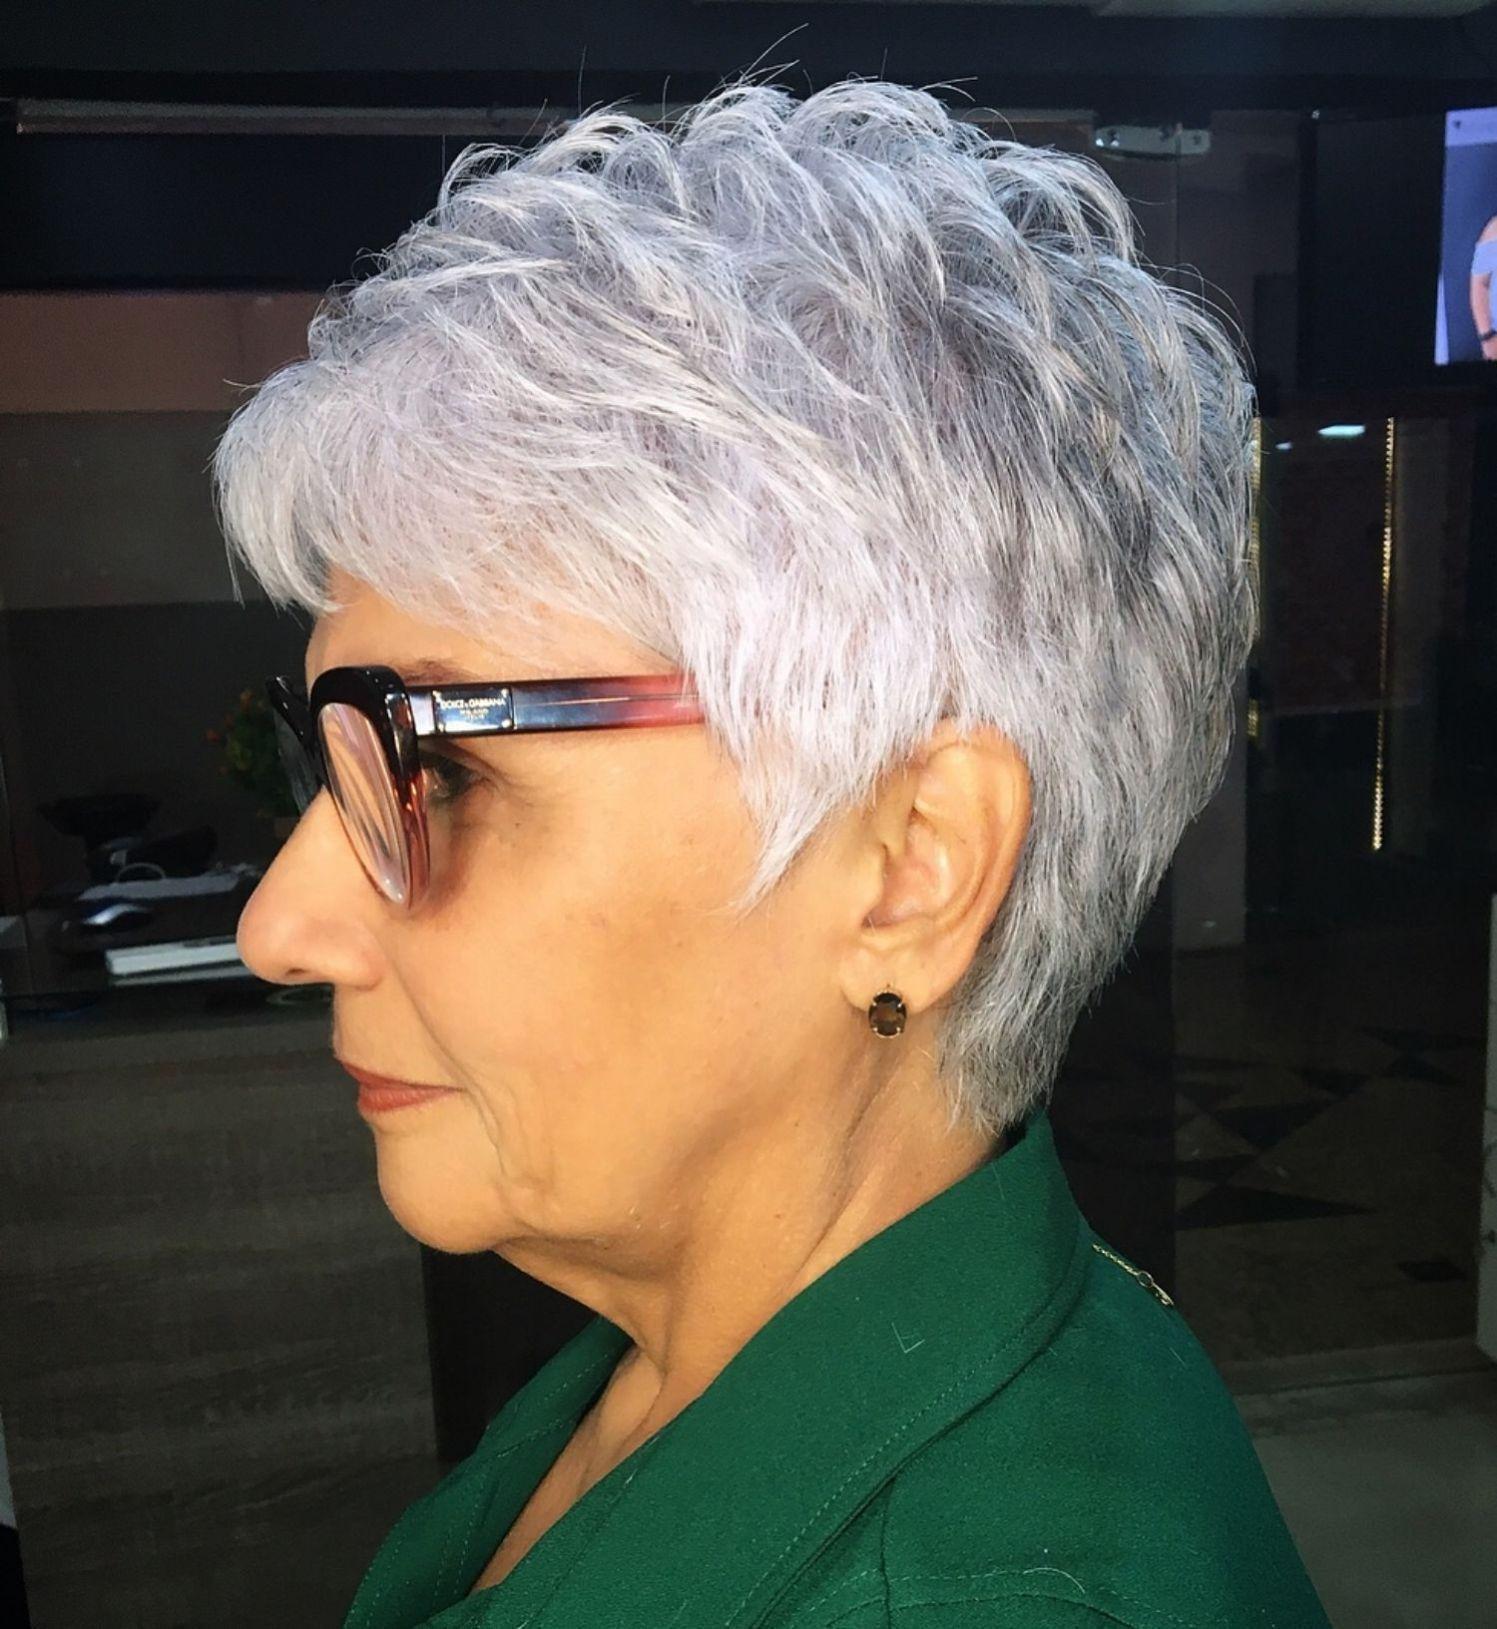 Ruffled Purple Tinted Gray Pixie Short Hair Older Women Older Women Hairstyles Cool Hairstyles